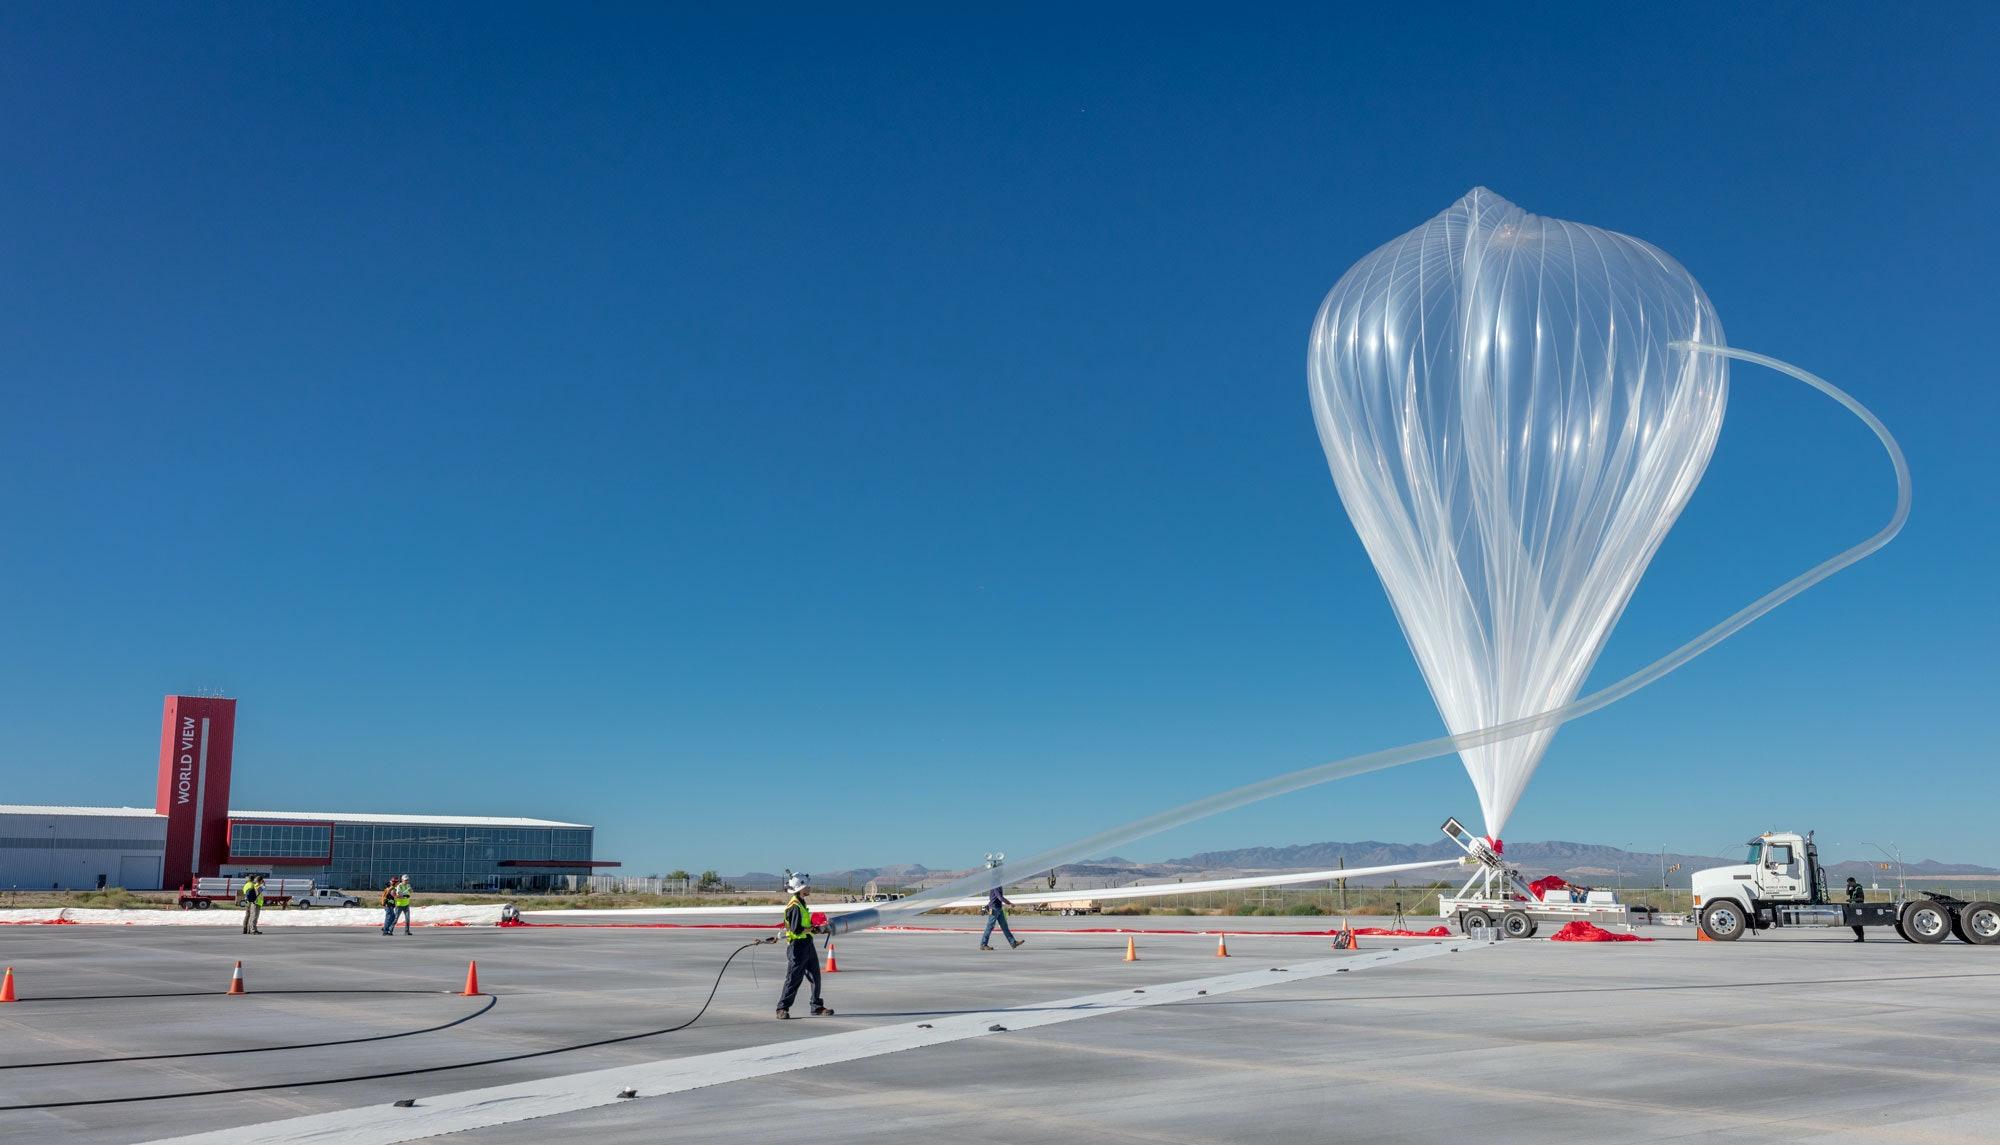 World View Stratollite balloons